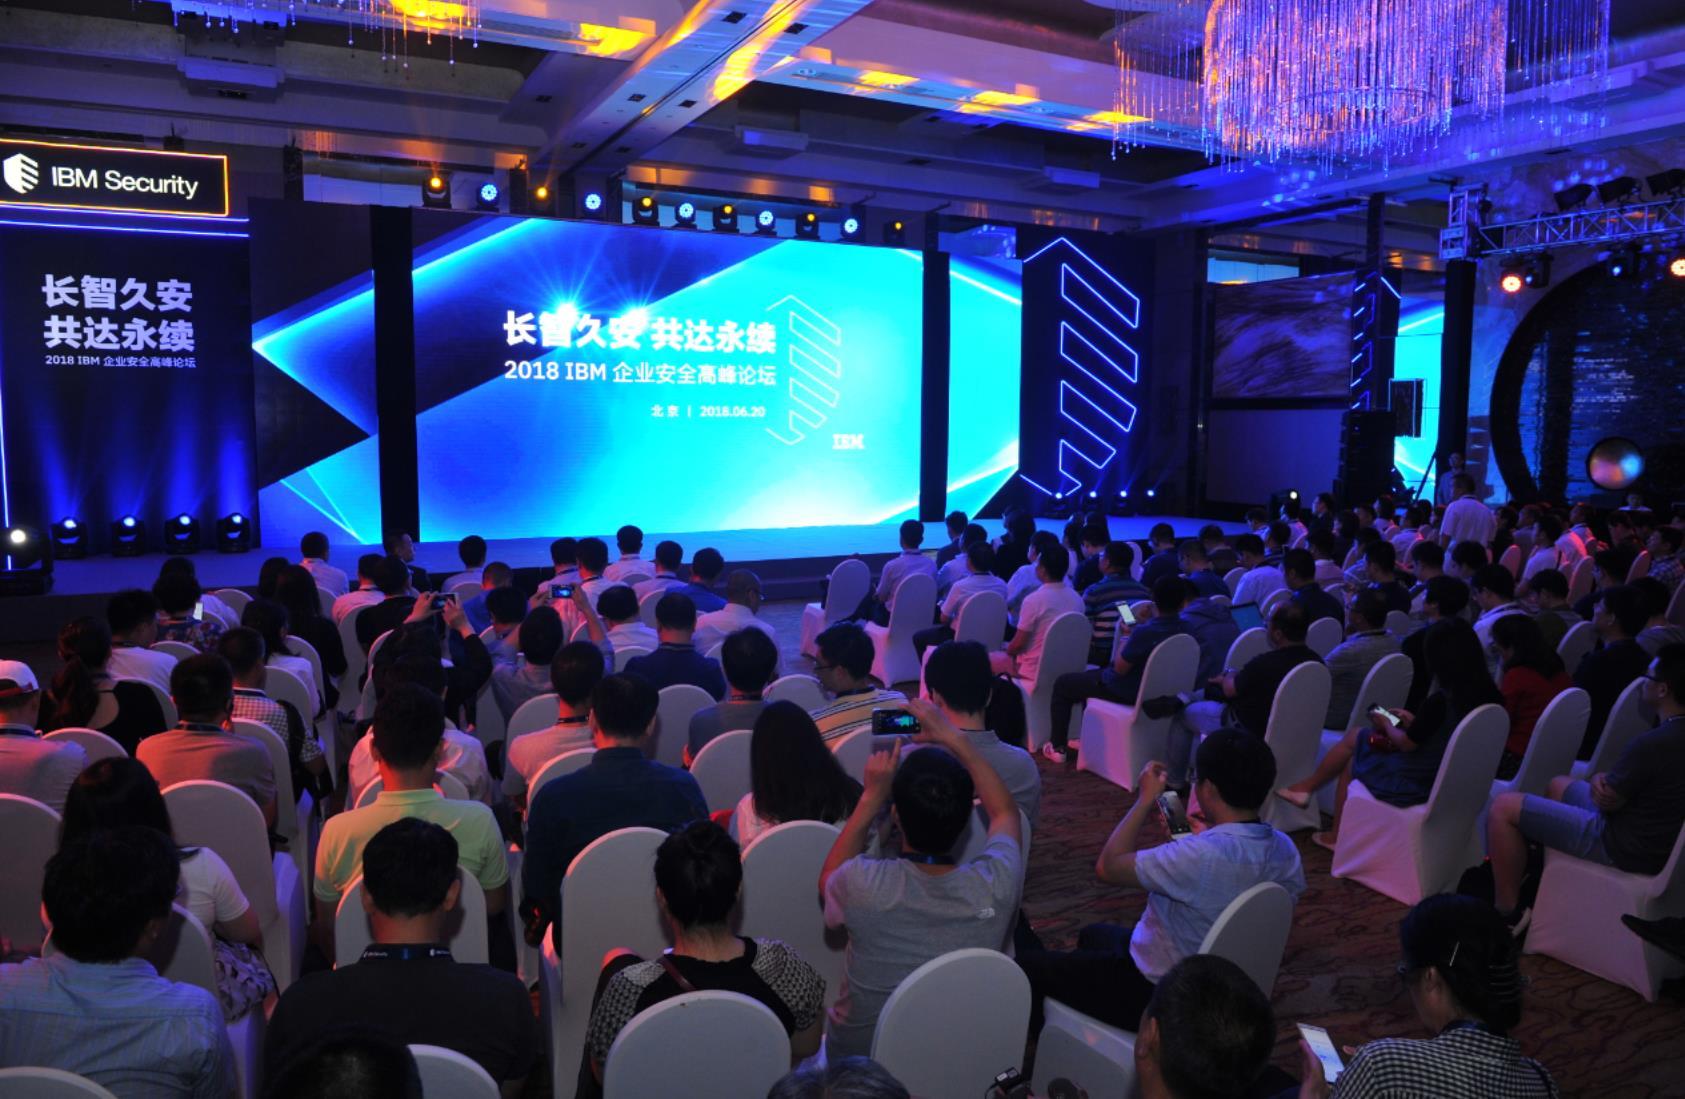 2018 IBM 企业安全高峰论坛在北京召开